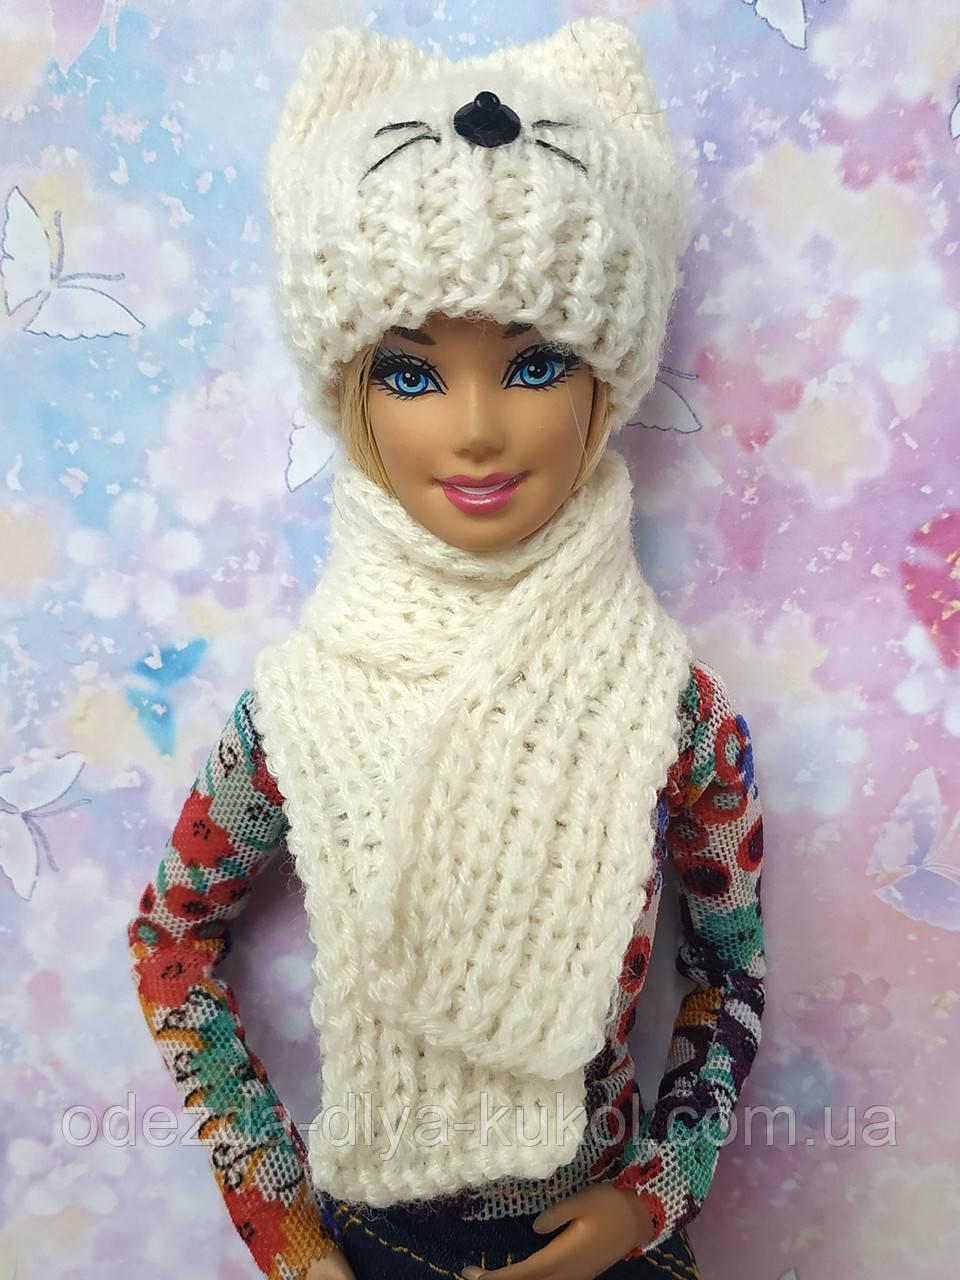 Одежда для кукол Барби - шапка и шарфик*